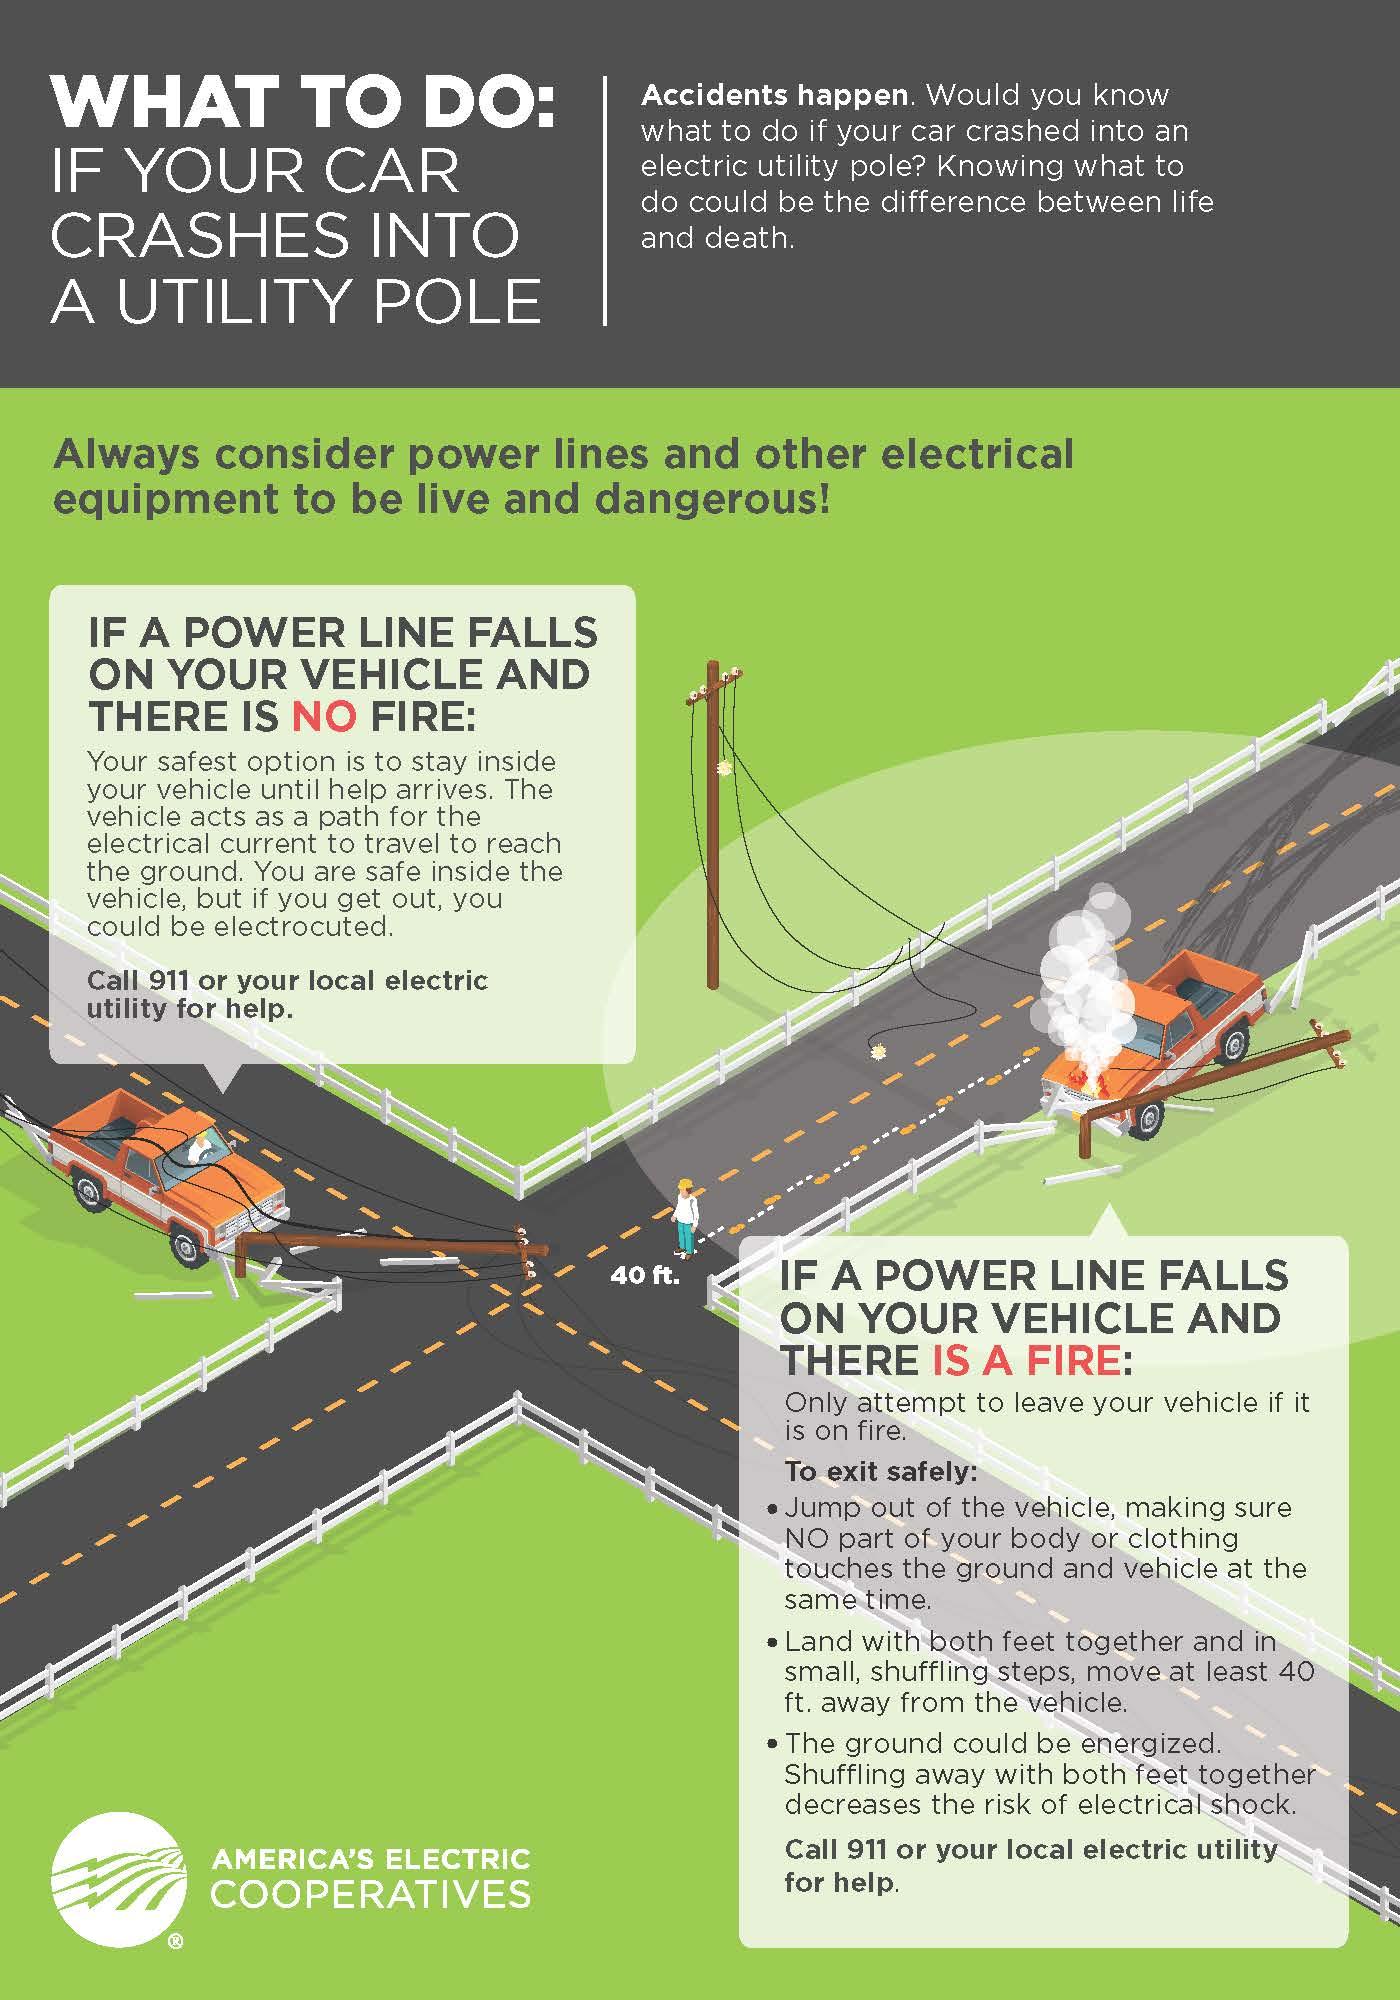 Vehicle Pole Collision Graphic